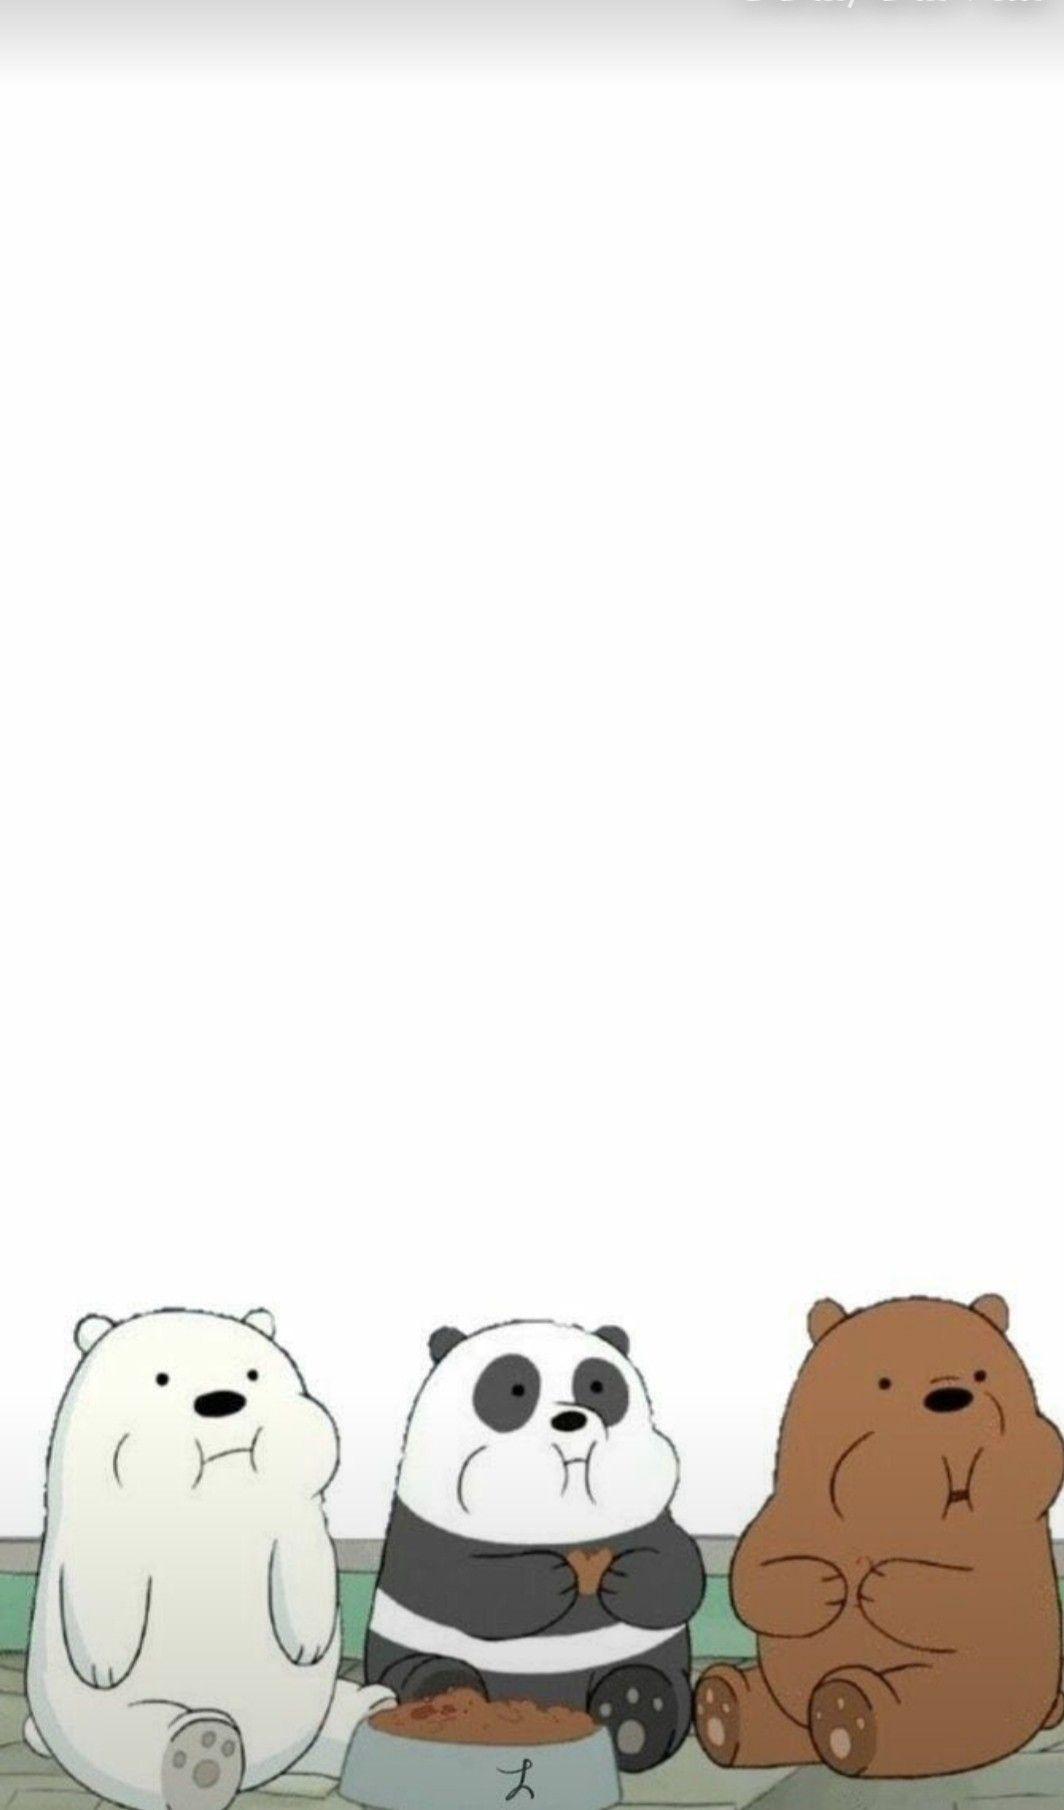 Pin de Hanan Arour em The three bears | Wallpaper de urso, Wallpapers